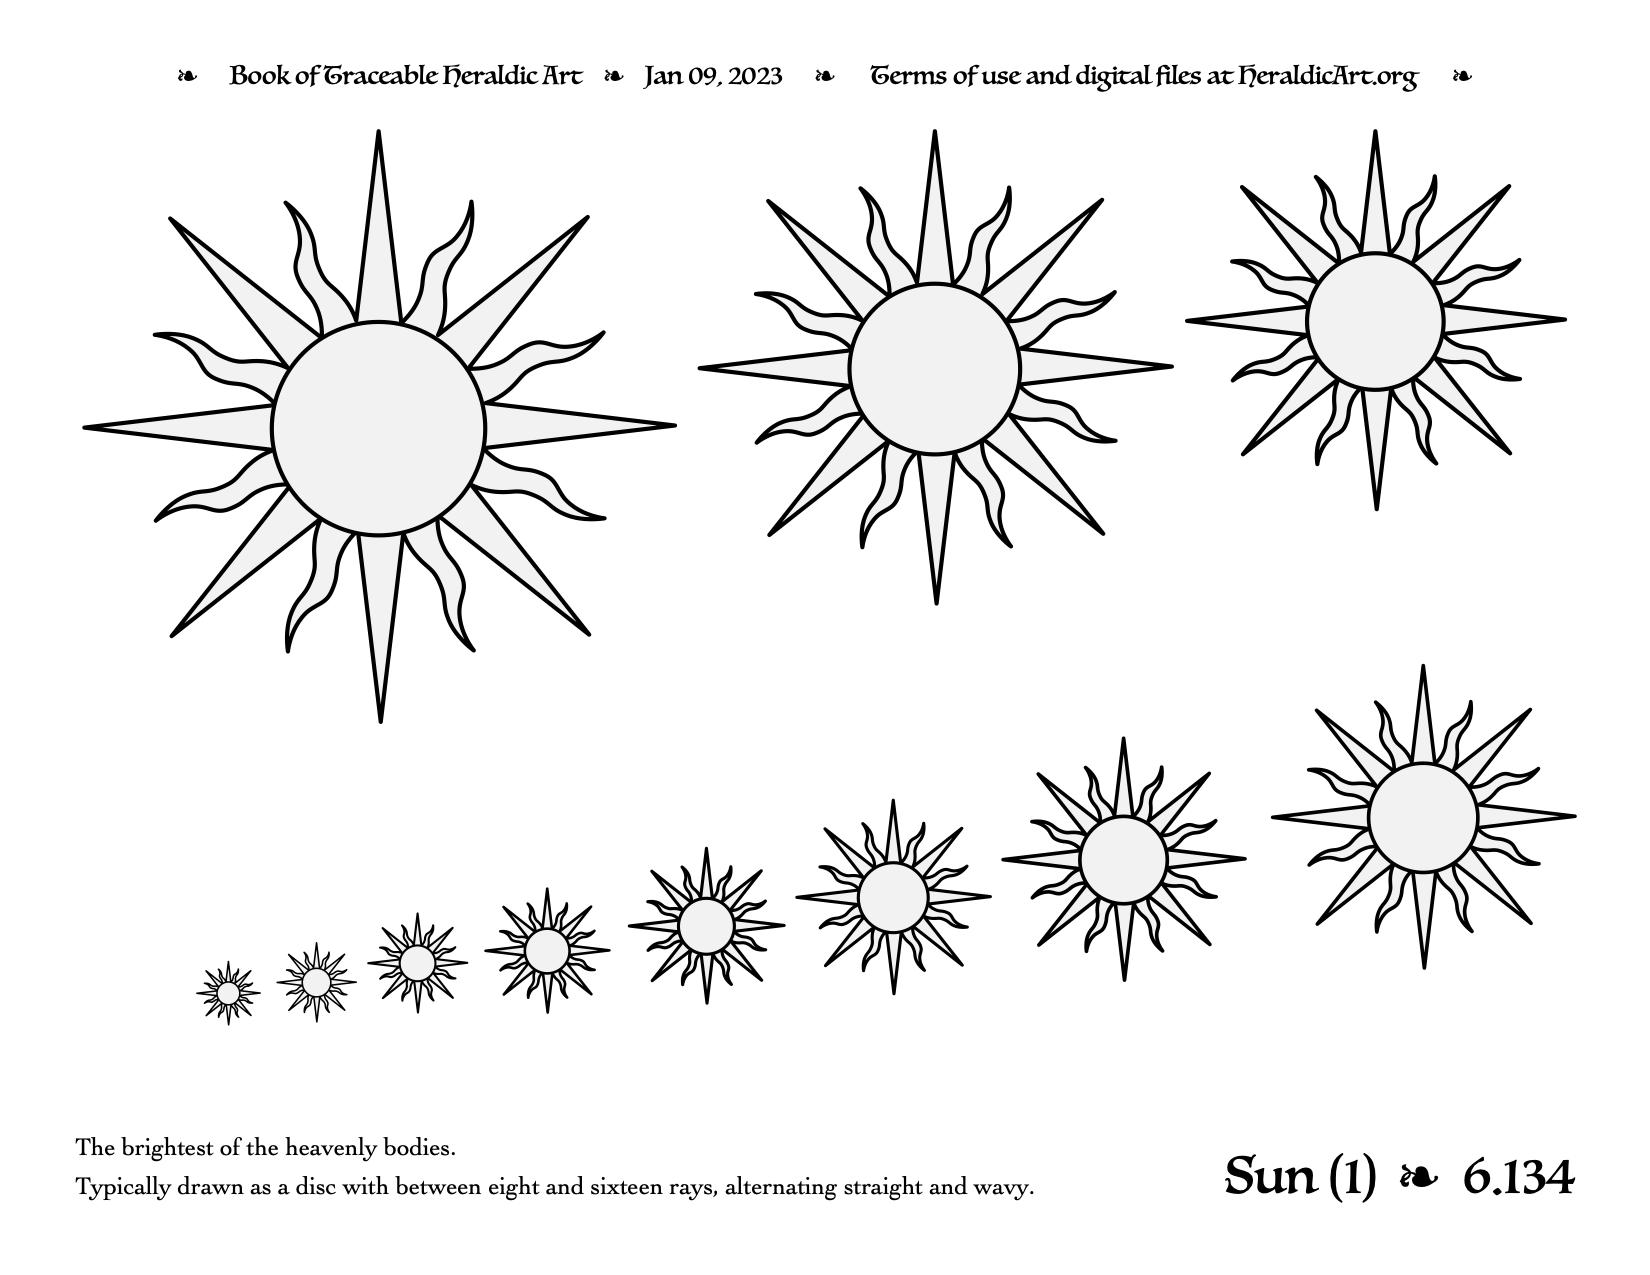 Sun Traceable Heraldic Art